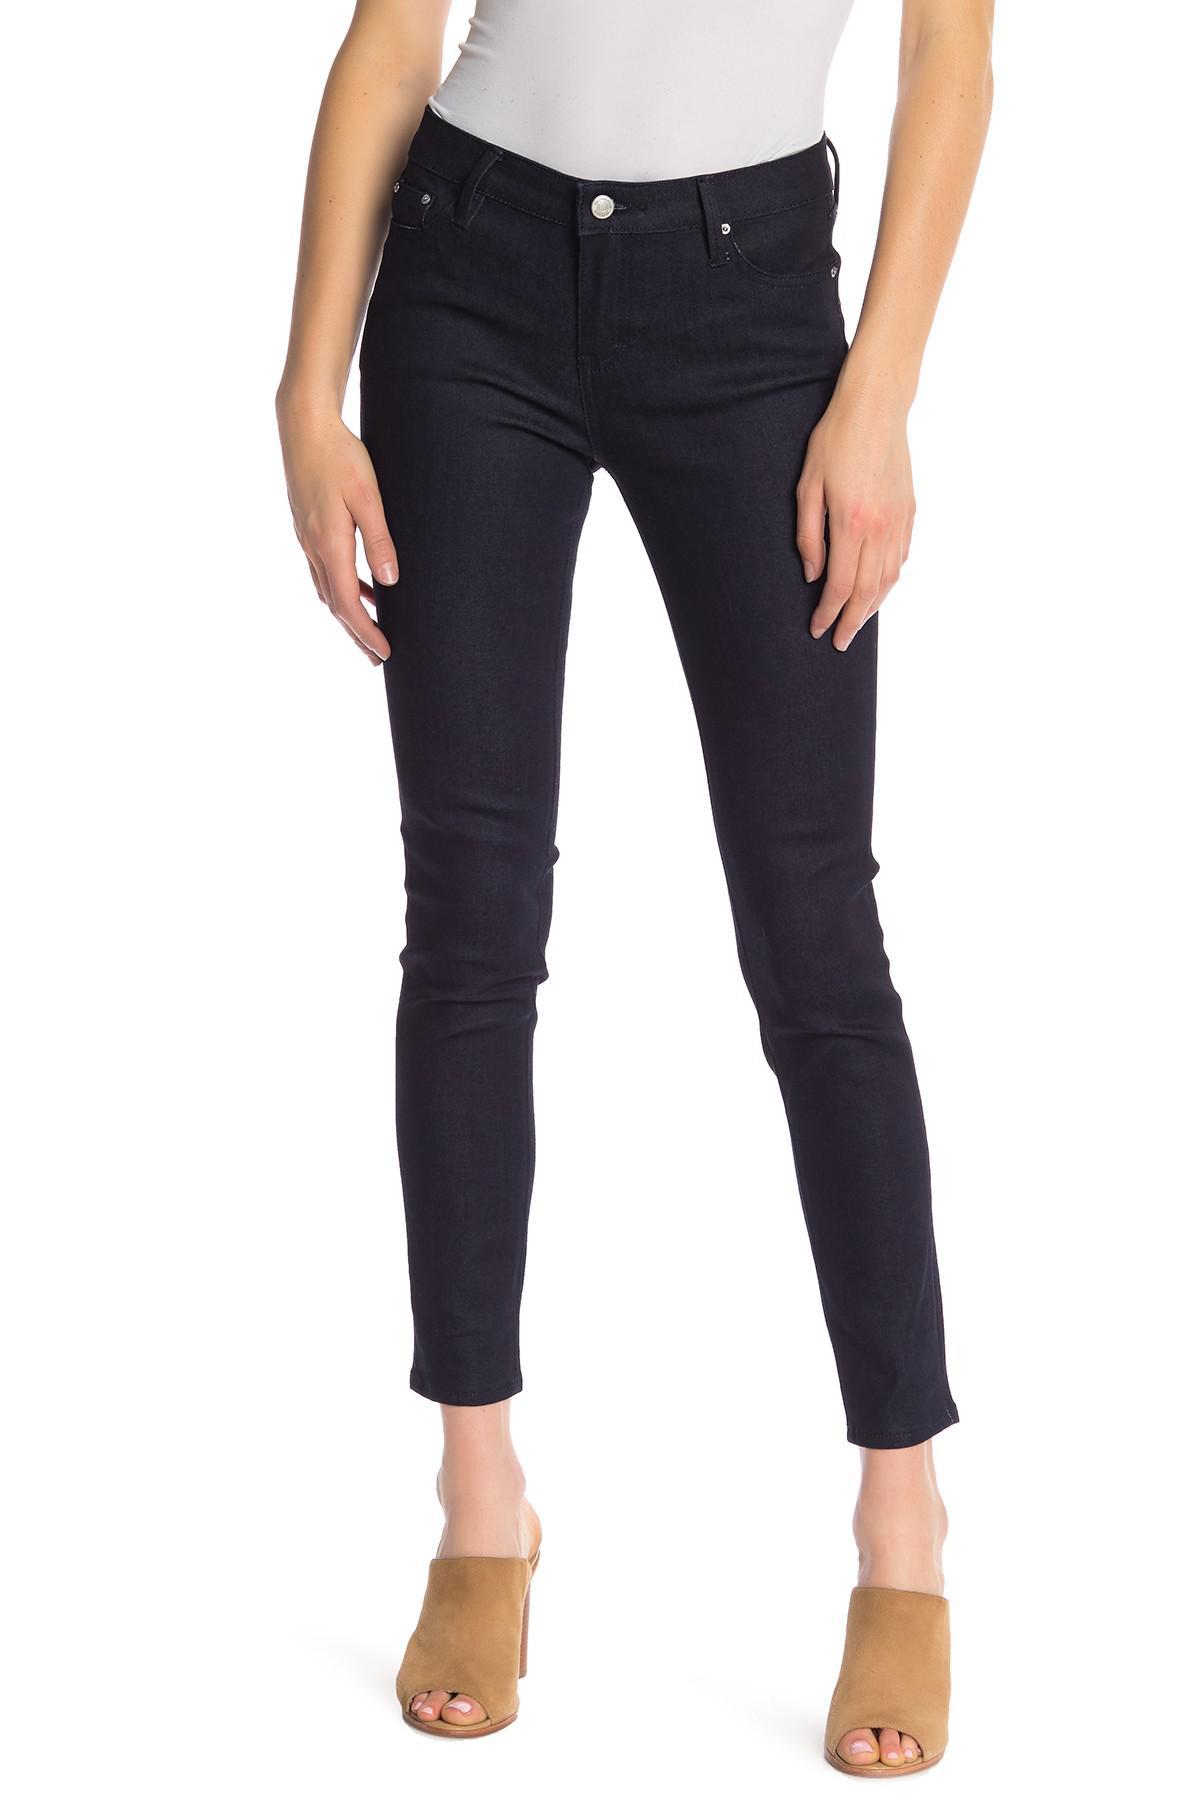 bbca3ff90123f Lyst - Earnest Sewn Natasha Mid Rise Skinny Jeans in Blue